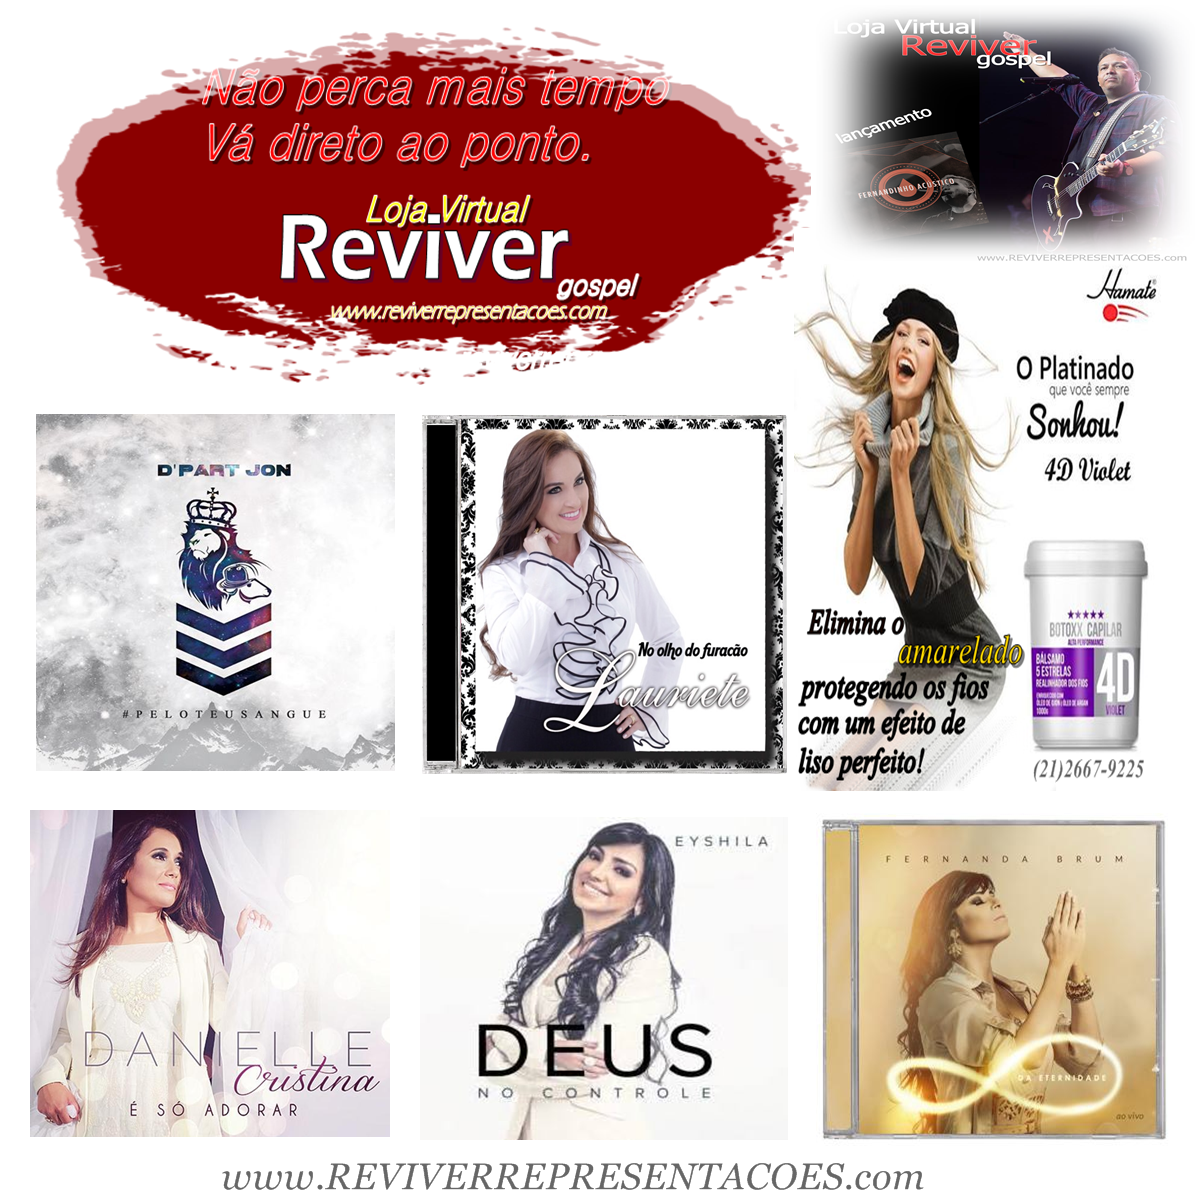 www.reviverrepresentacoes.com/loja